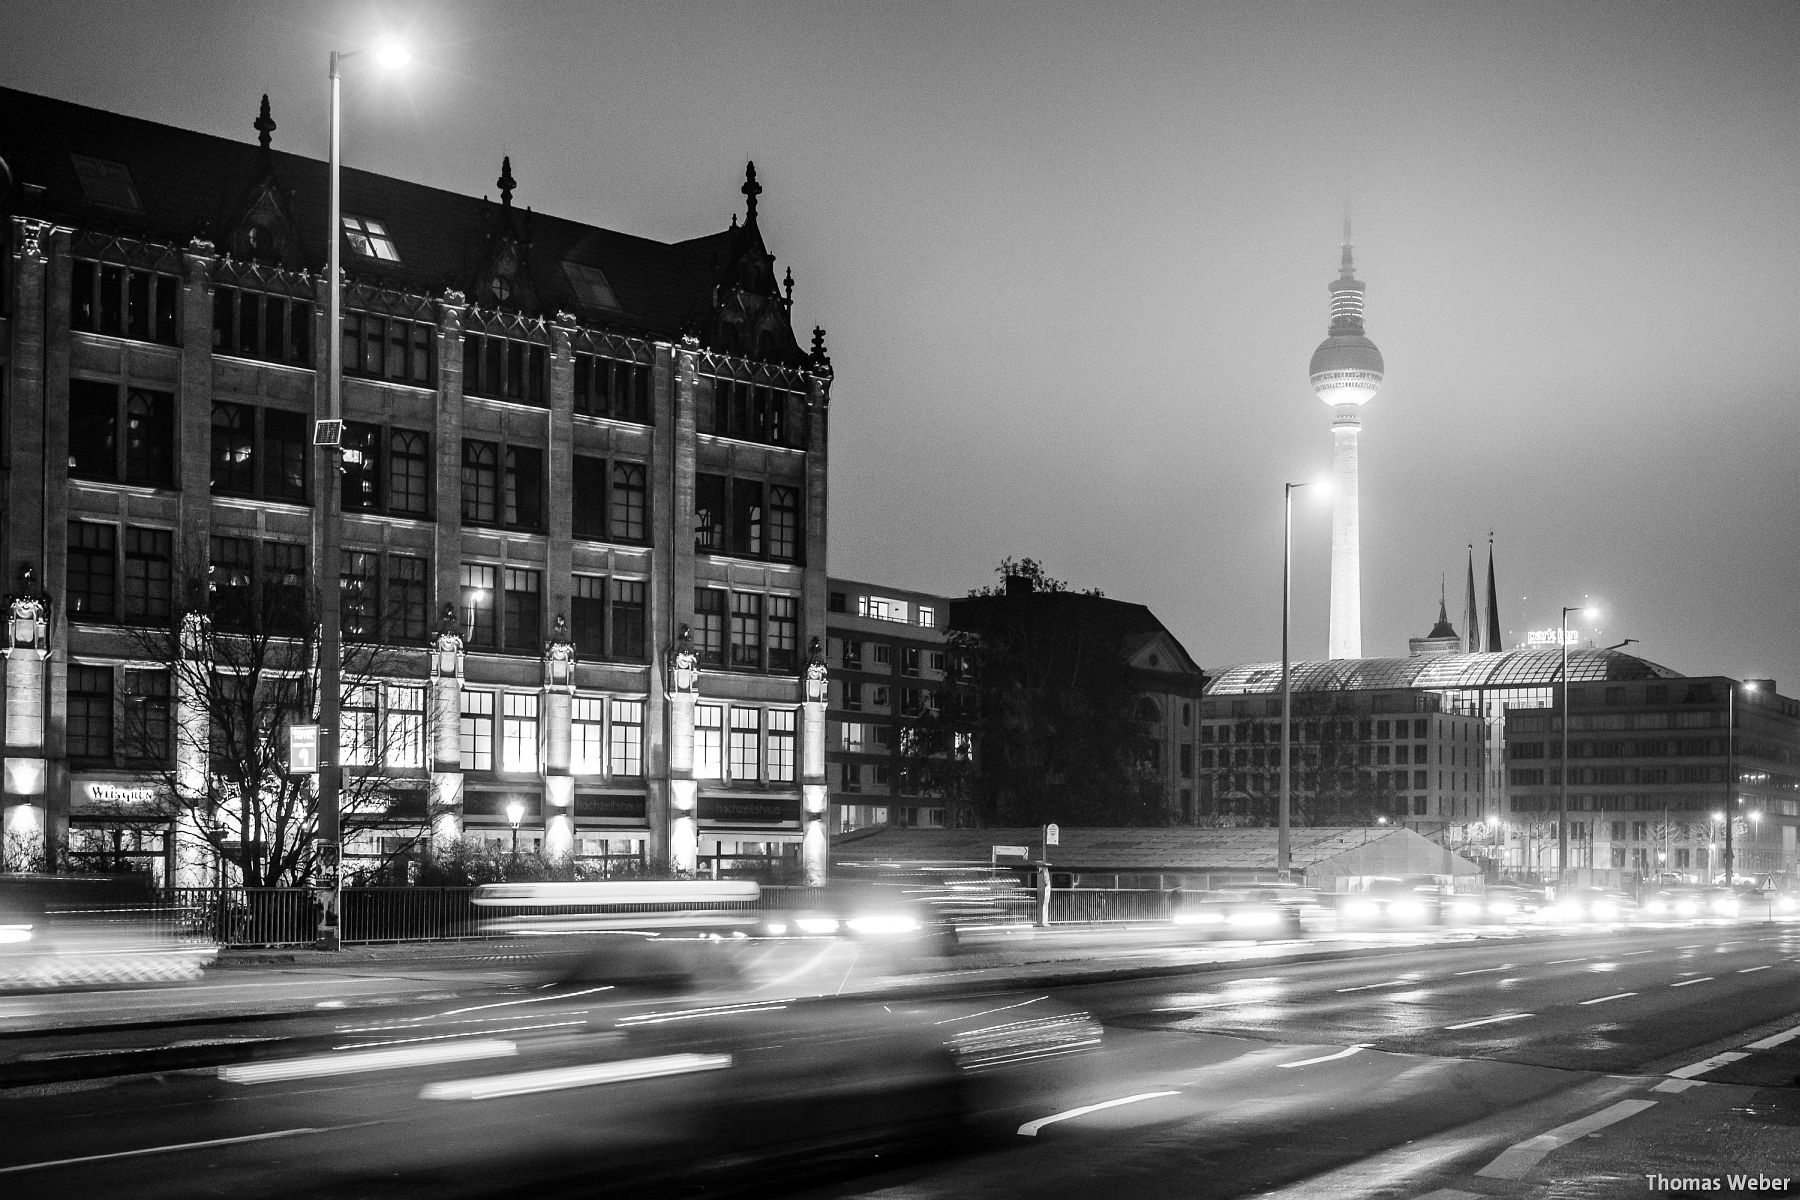 Fotograf Thomas Weber aus Oldenburg: Fernsehturm am Alexanderplatz in Berlin